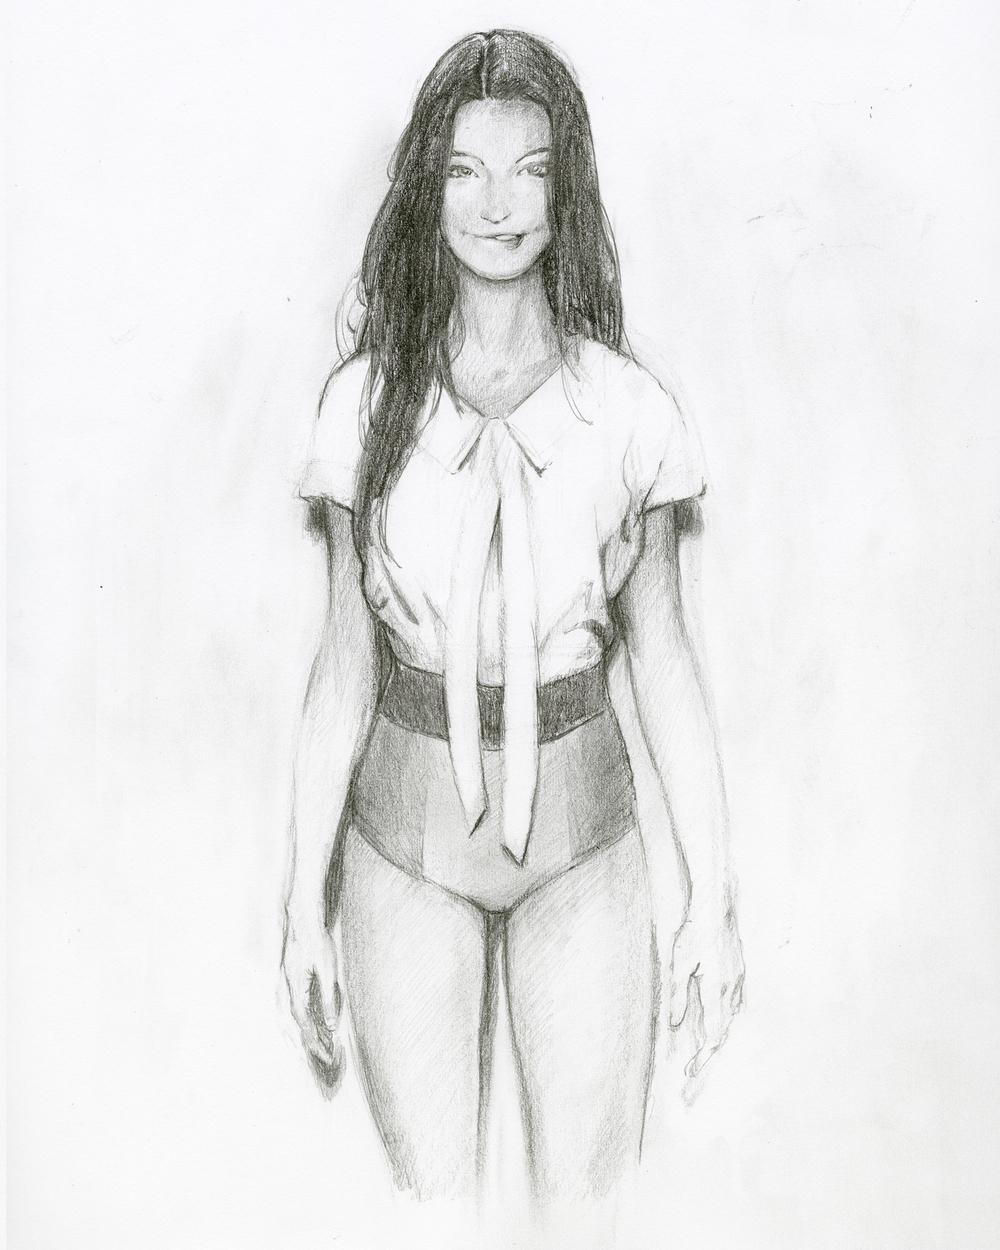 sketch-bow_david-jackowski_alvatron-studio.jpg